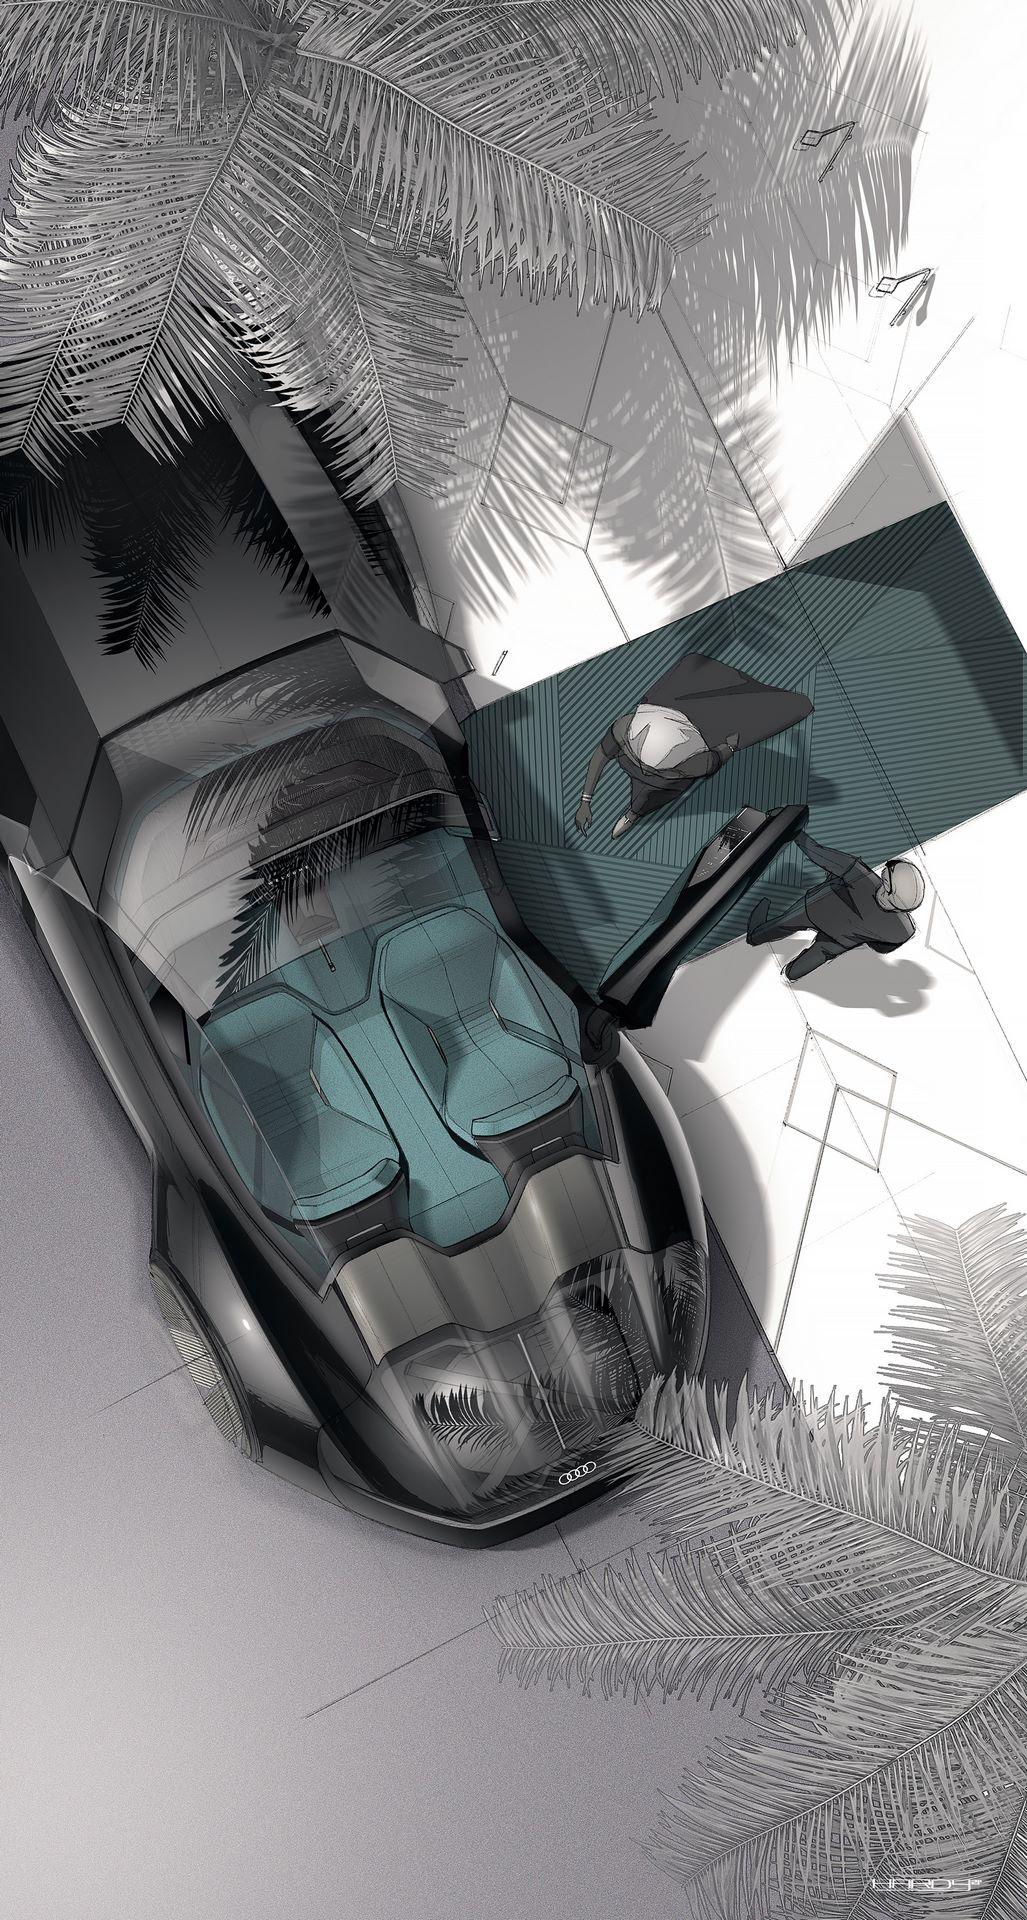 Audi-Skysphere-Concept-10